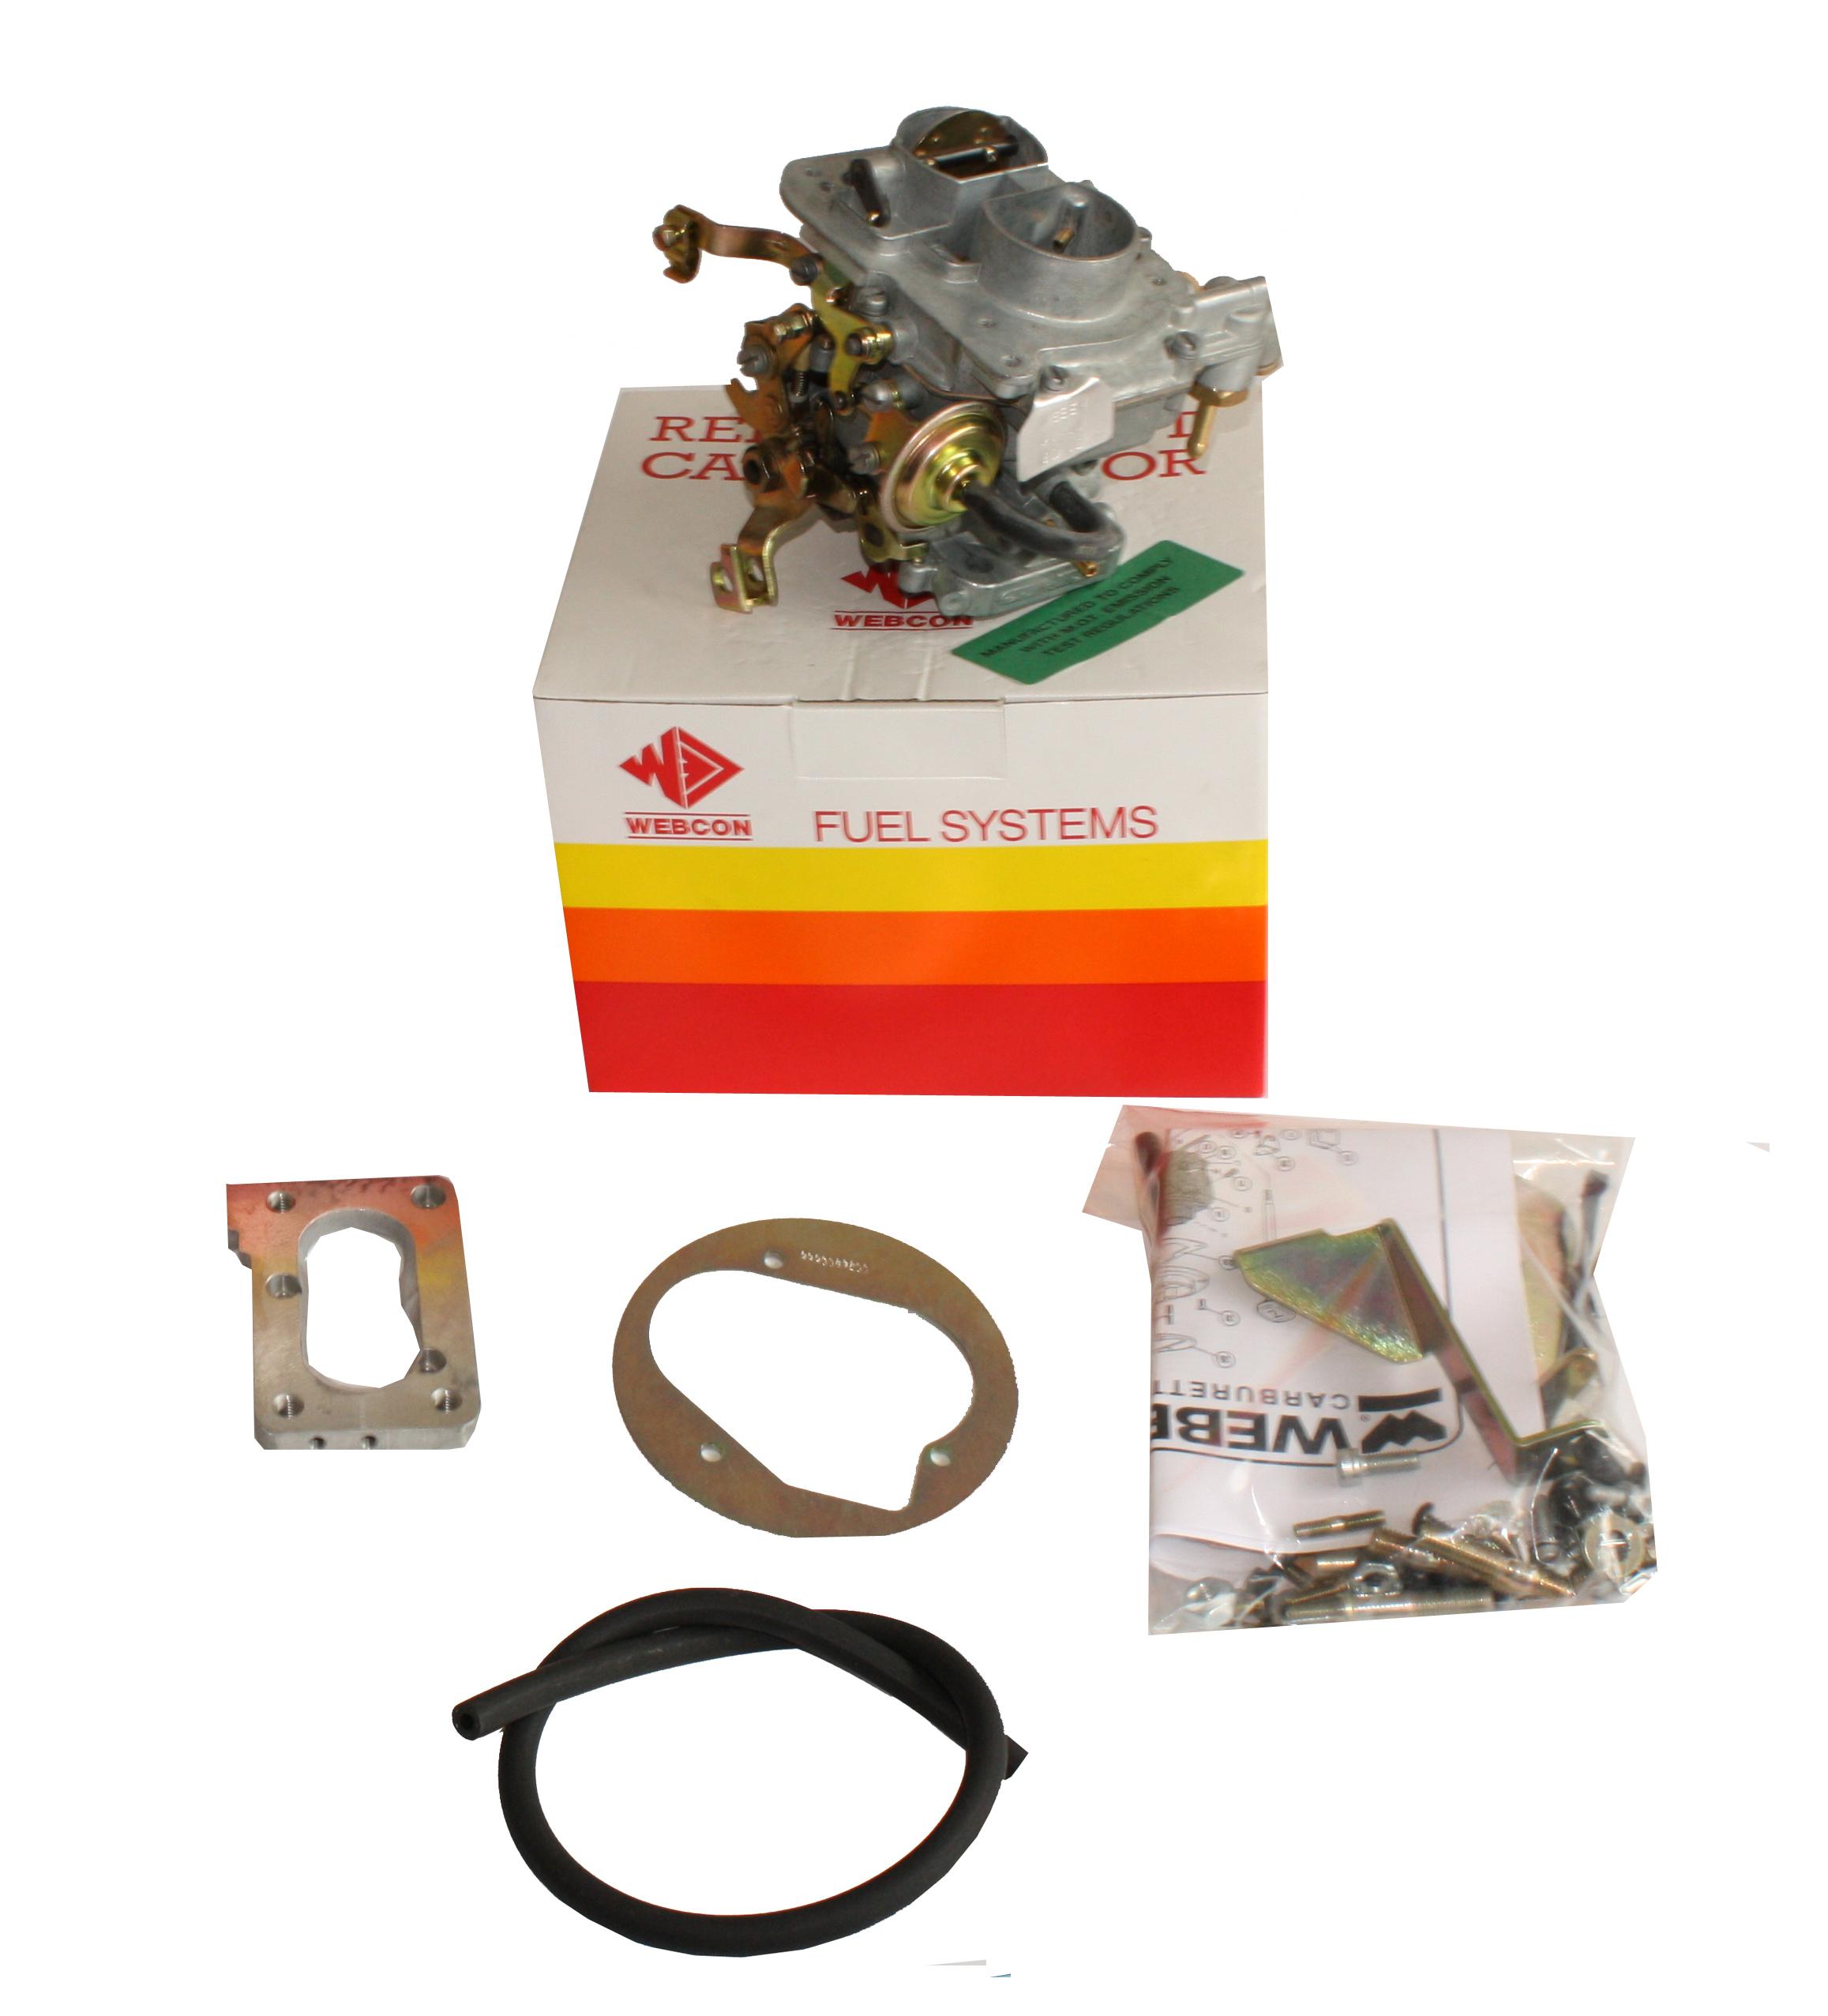 WEBER 32/34 DMTL CARB UPGRADE KIT Audi 80/VW Passat/Santana 1595cc) 1983-91 AUTO